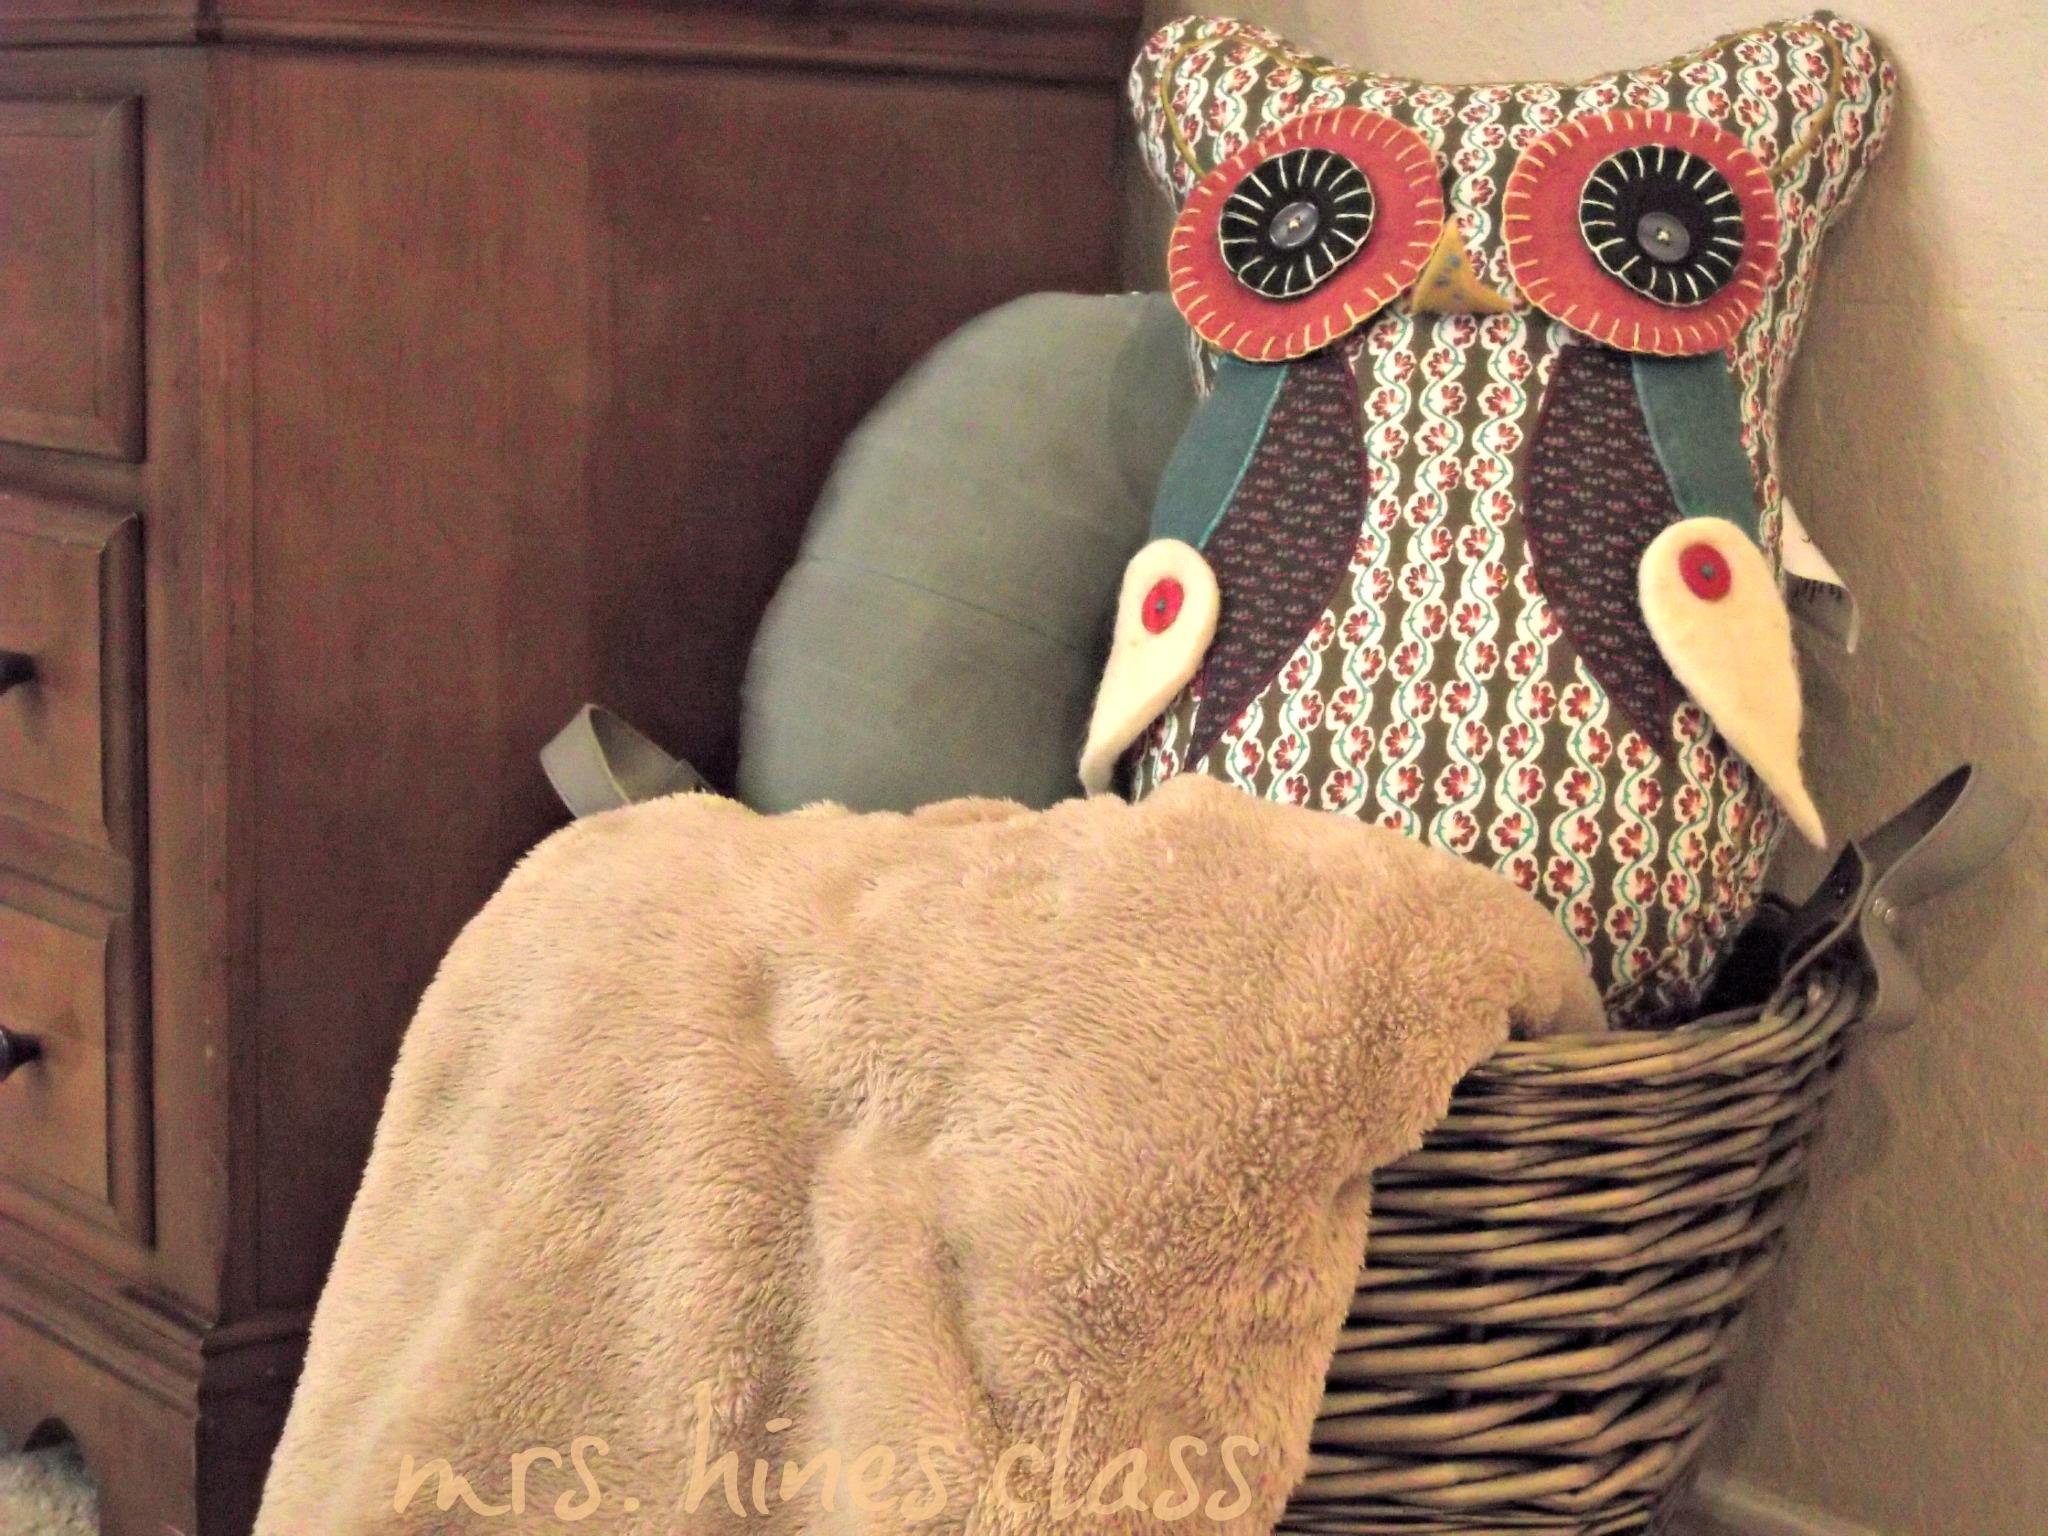 stuffed owl, blankets, decorative pillow, basket, fall, autumn